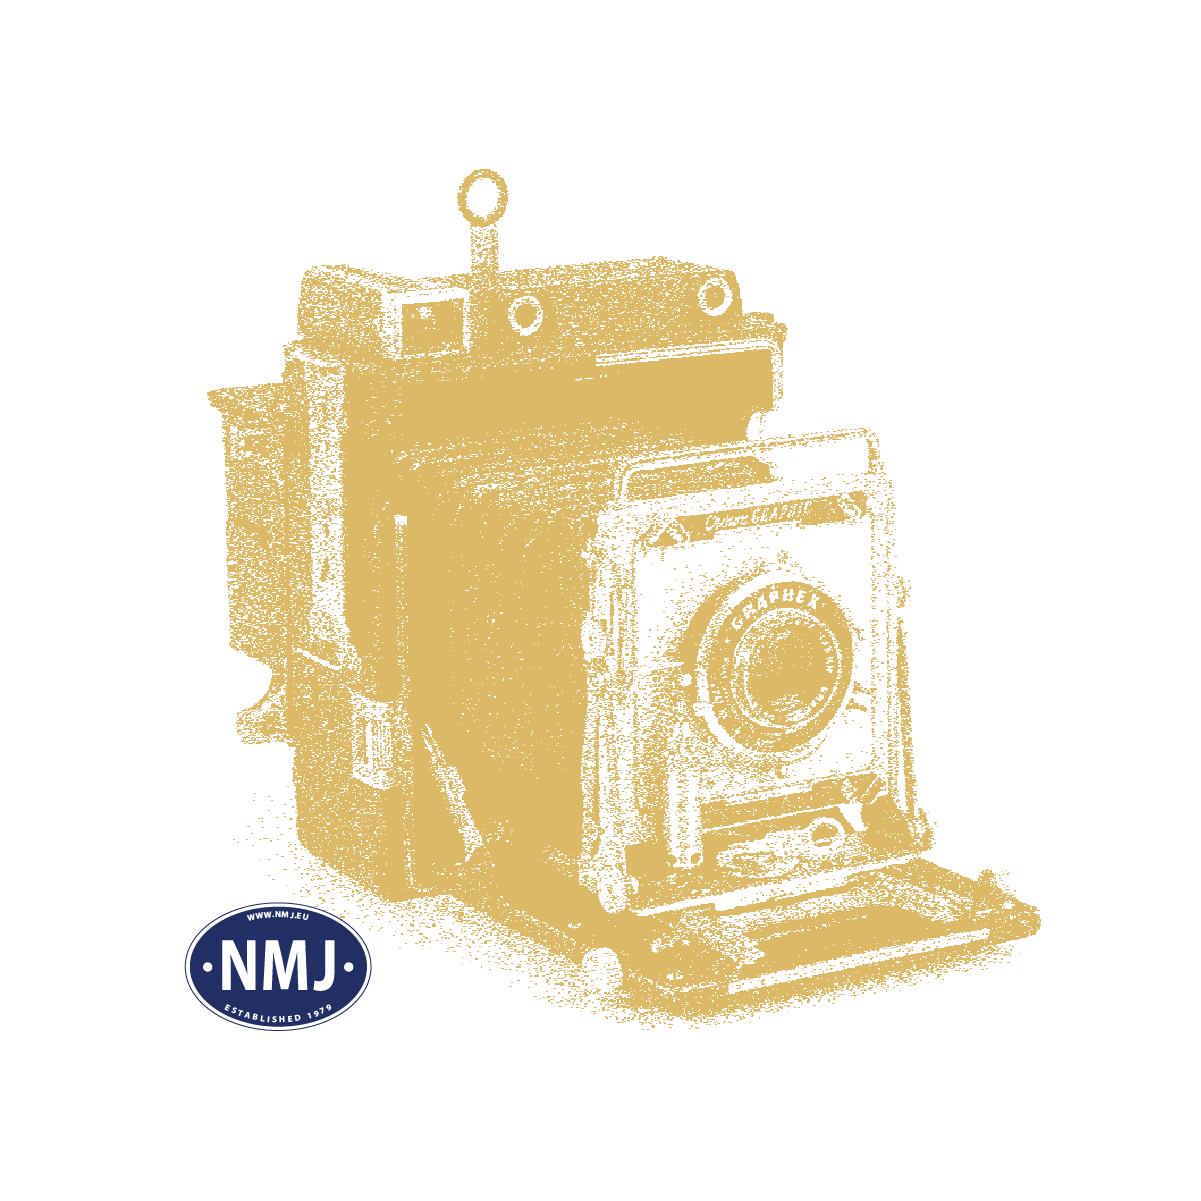 NMJT145006 - NMJ Topline NSB Di3.602 Rot/Schwarz mit GM und OL Logo 1994, DCC m/ Sound, Spür 0